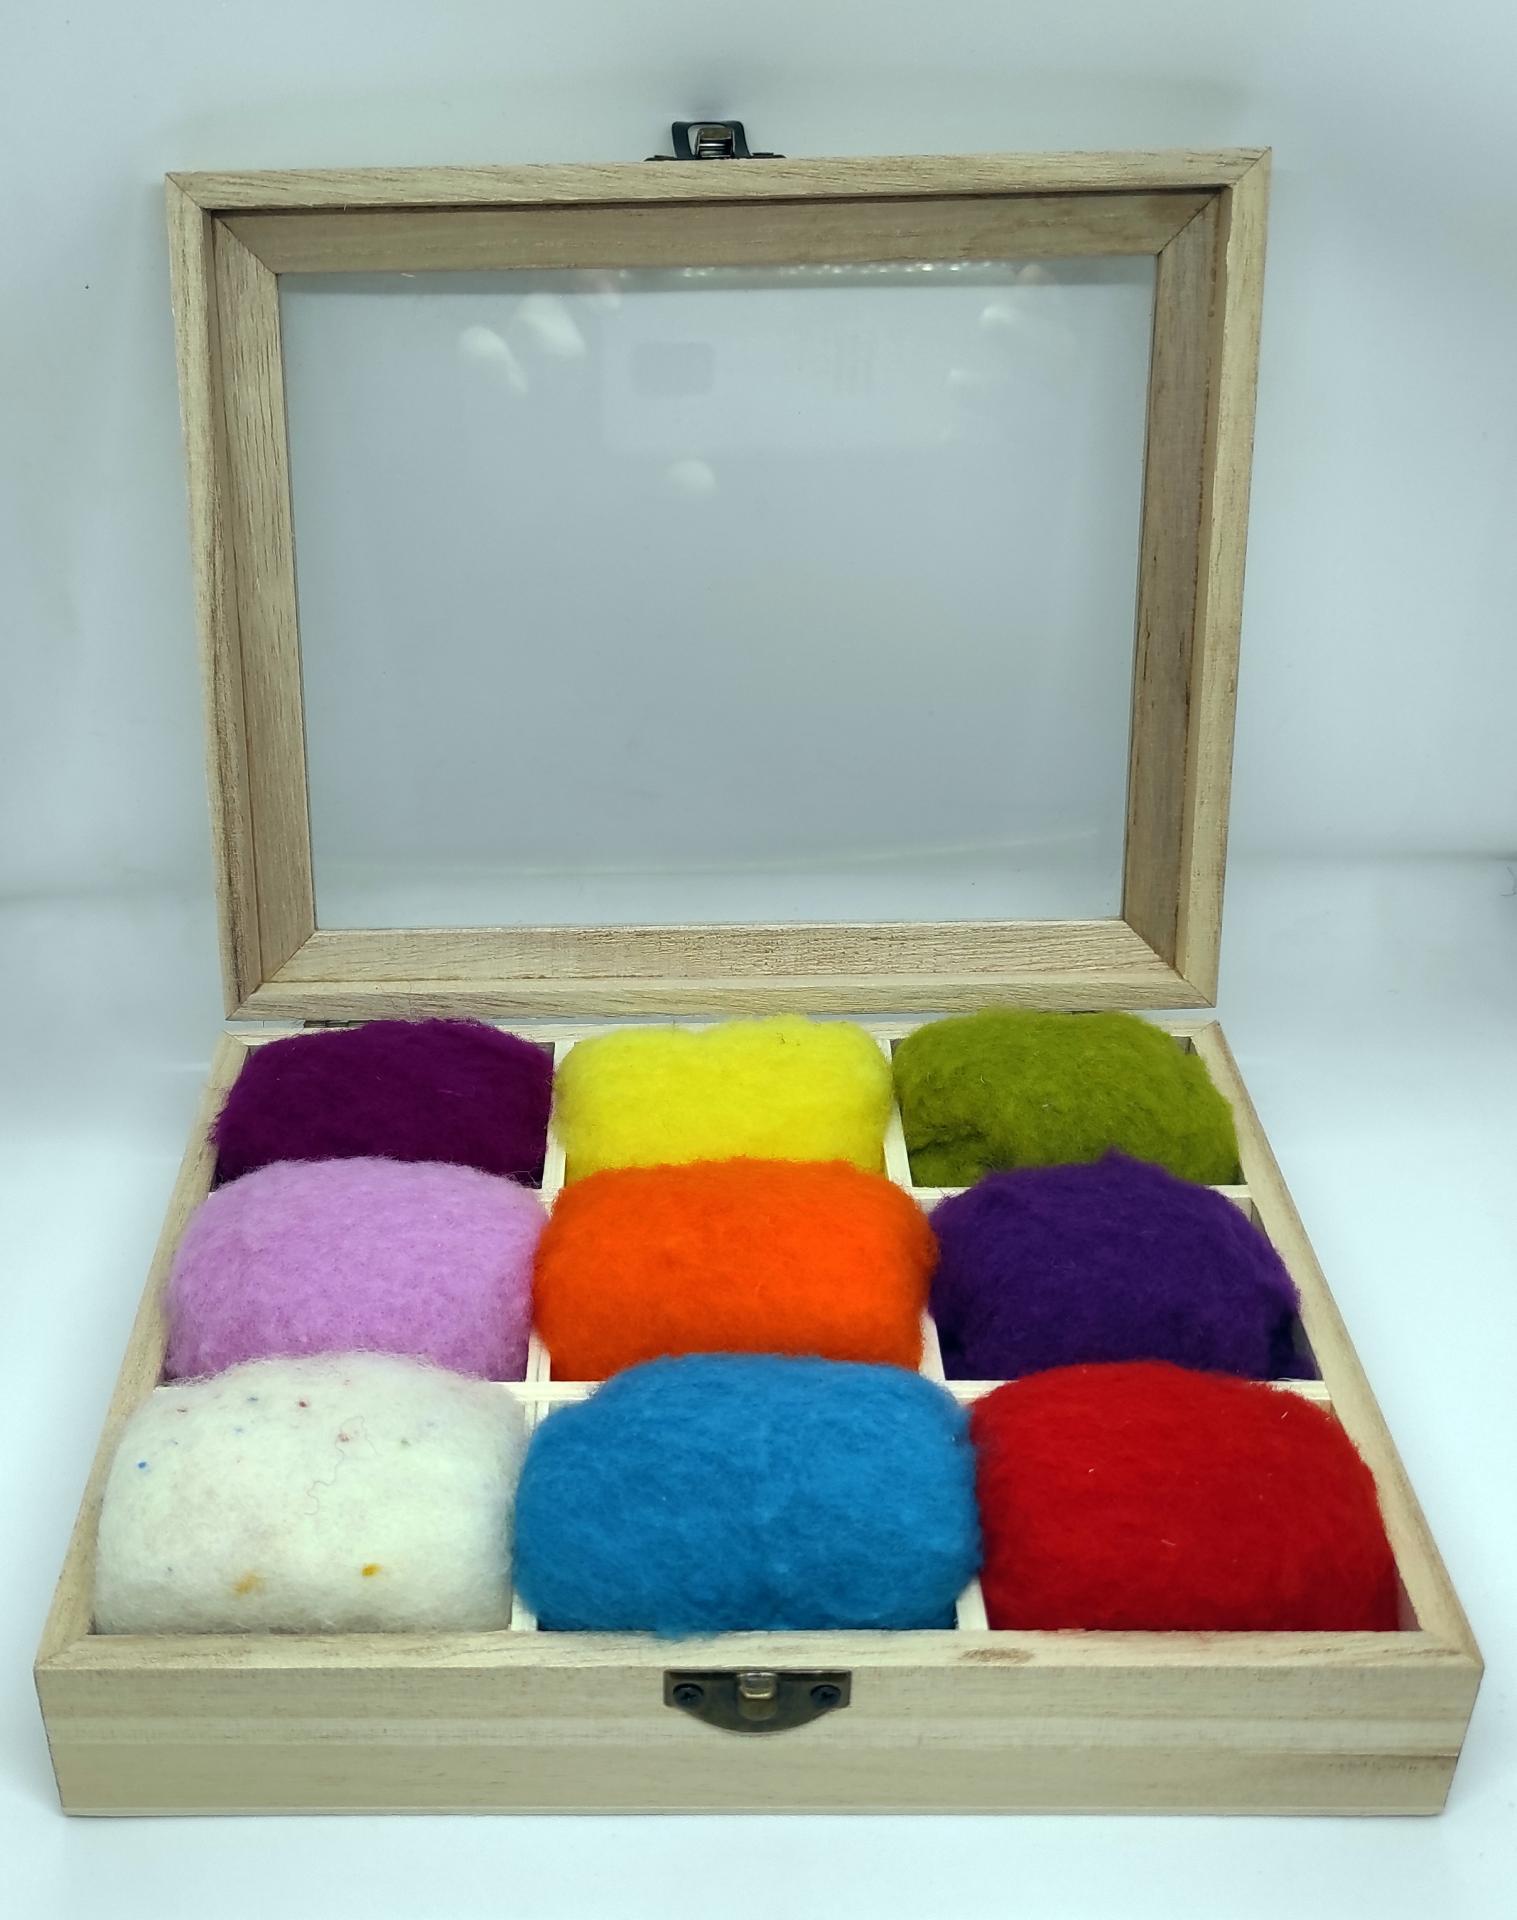 Caja de lanas variadas